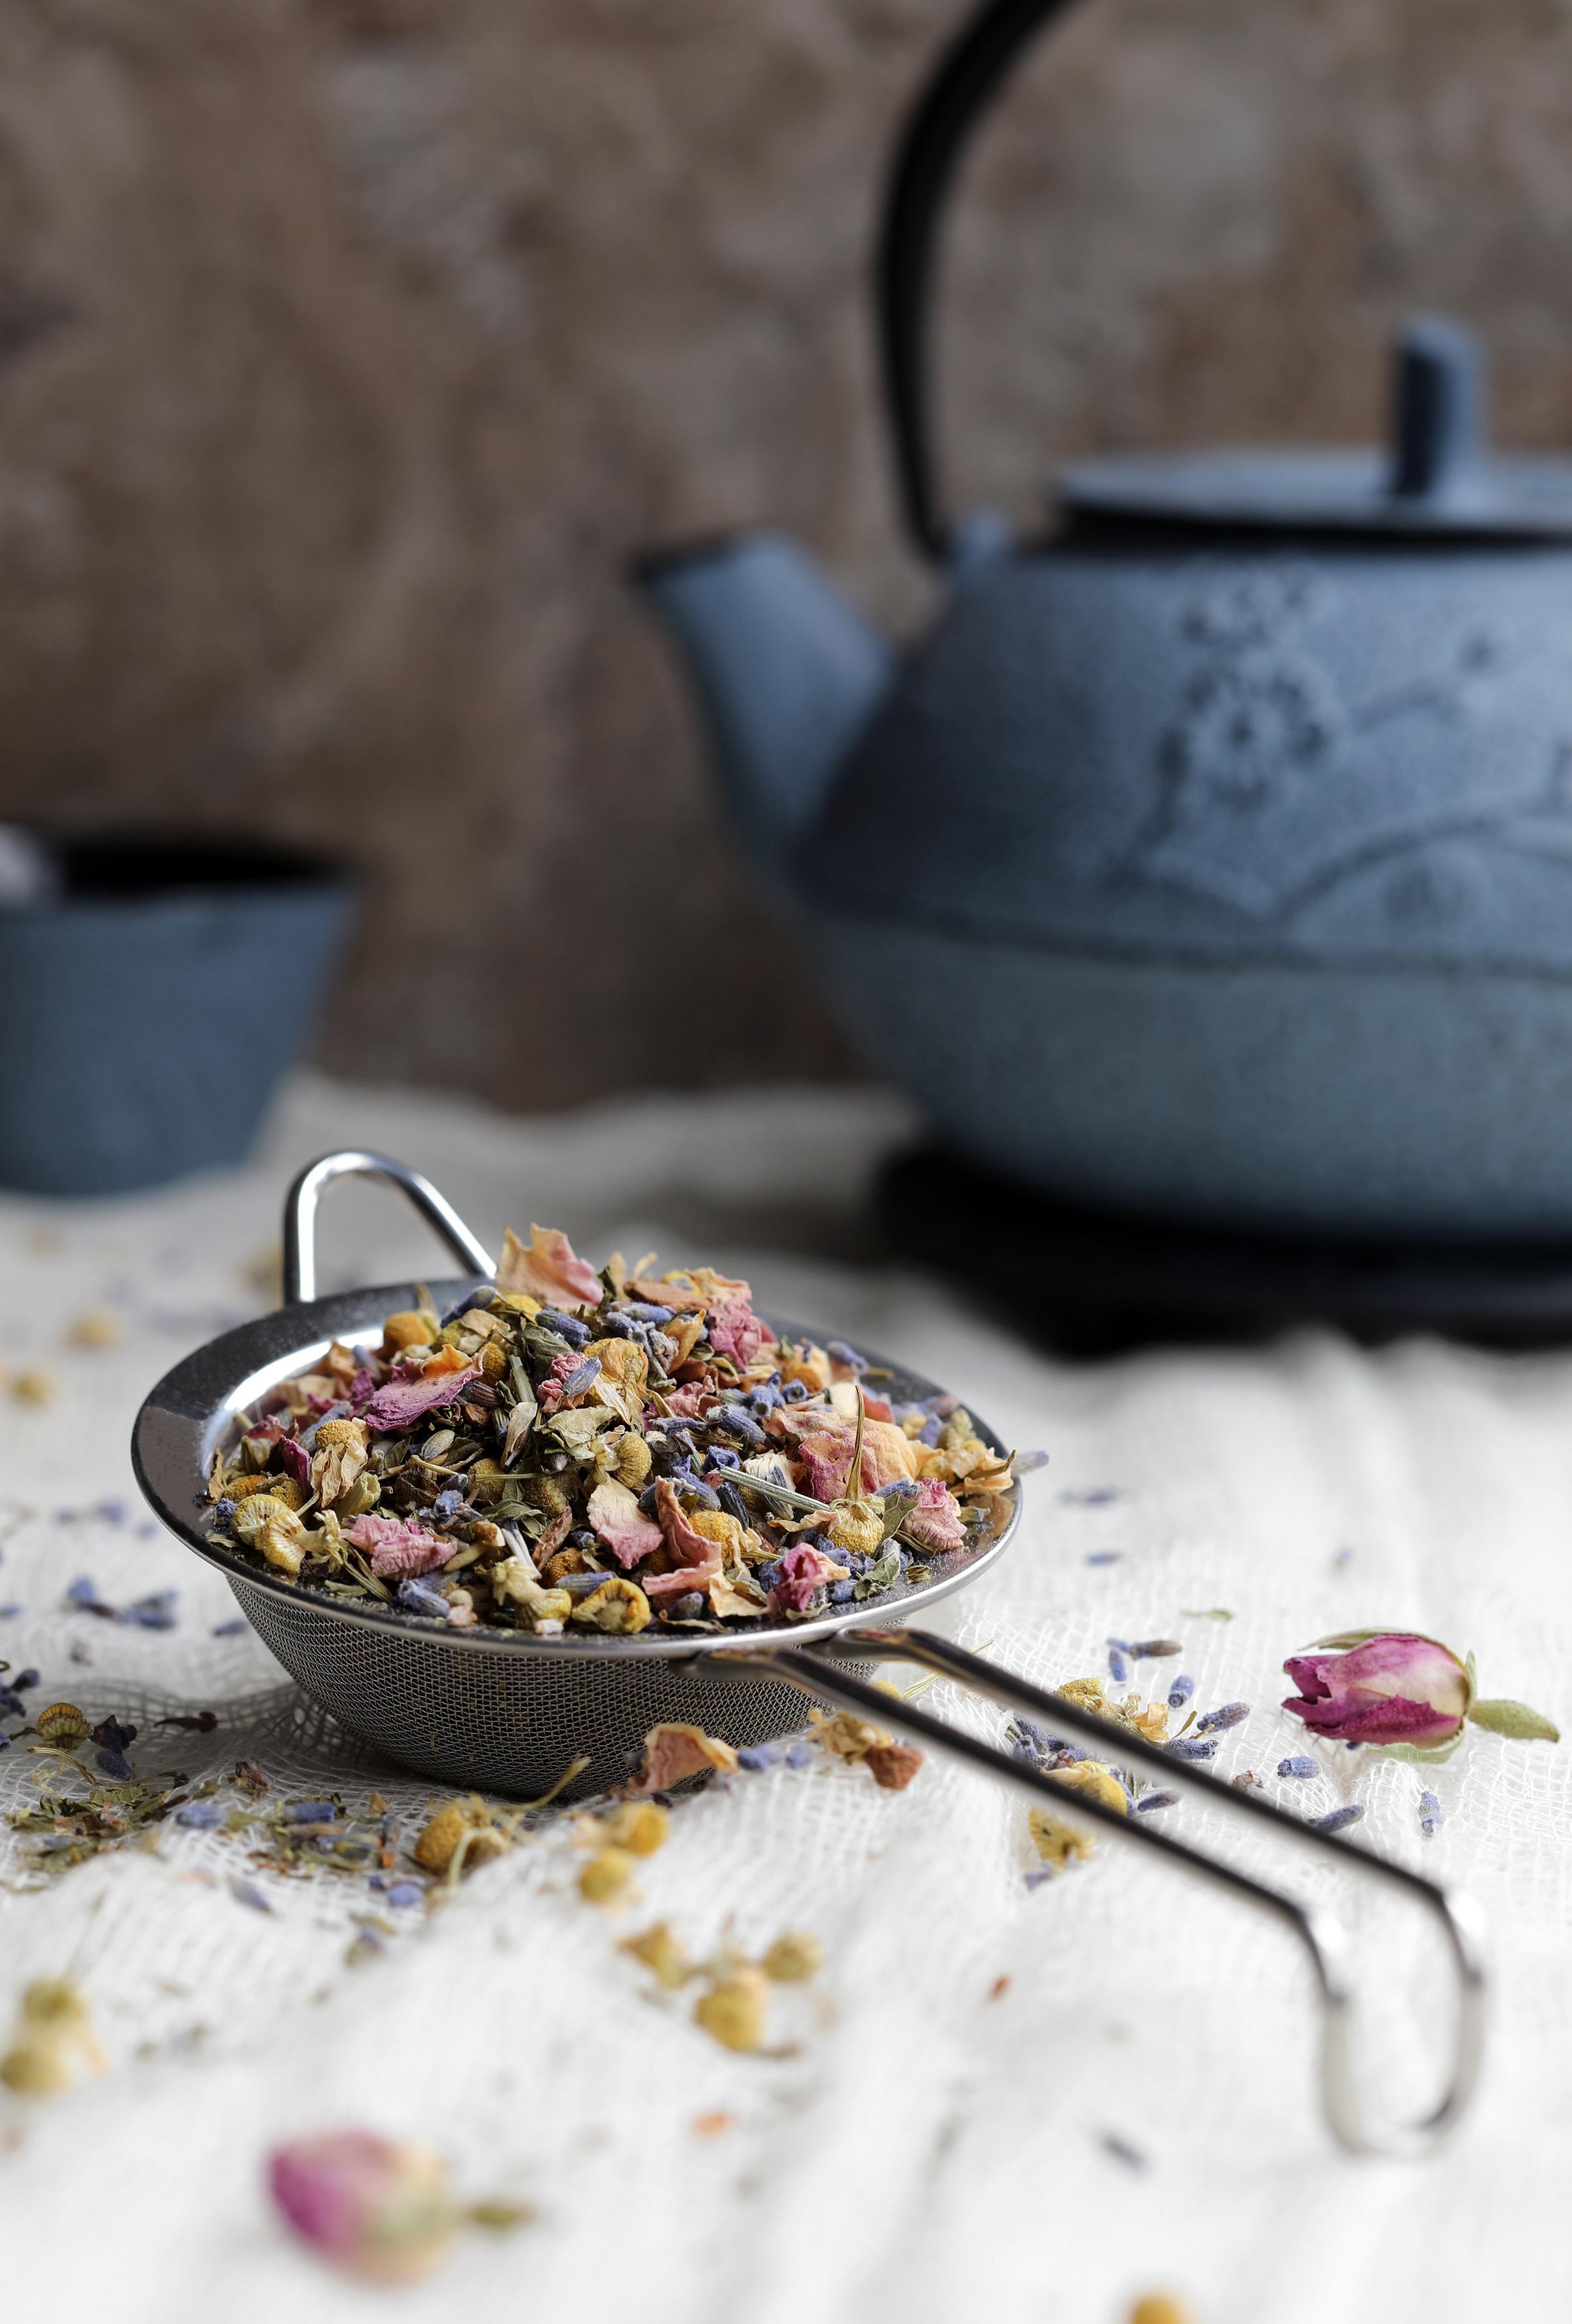 Metal mesh strainer holding floral herbal tea sitting next to cast iron tea pot